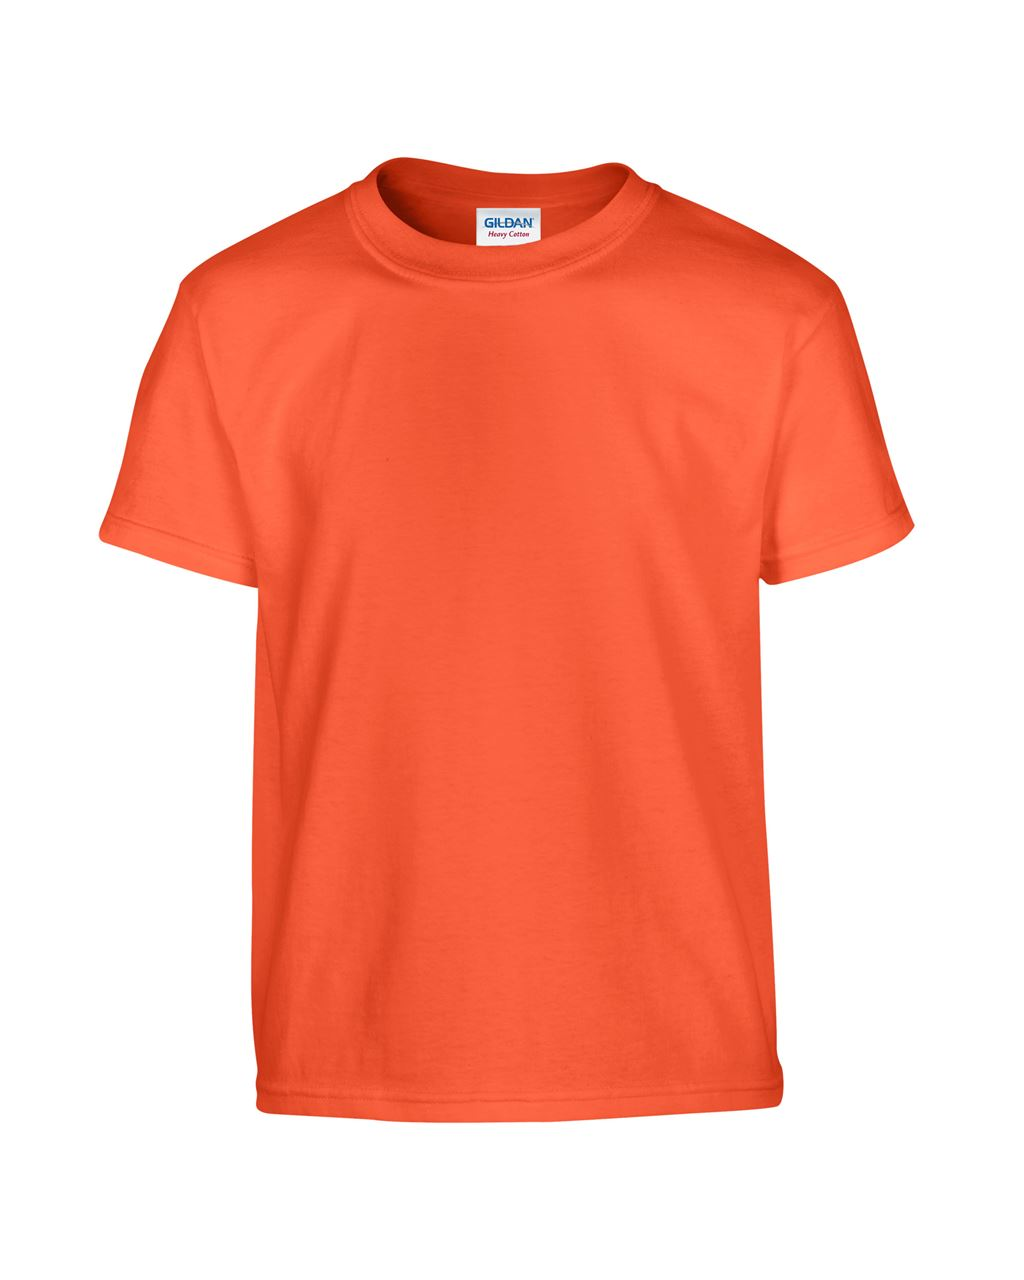 Gildan heavy cotton youth t custom t shirts toronto for Custom t shirts gildan